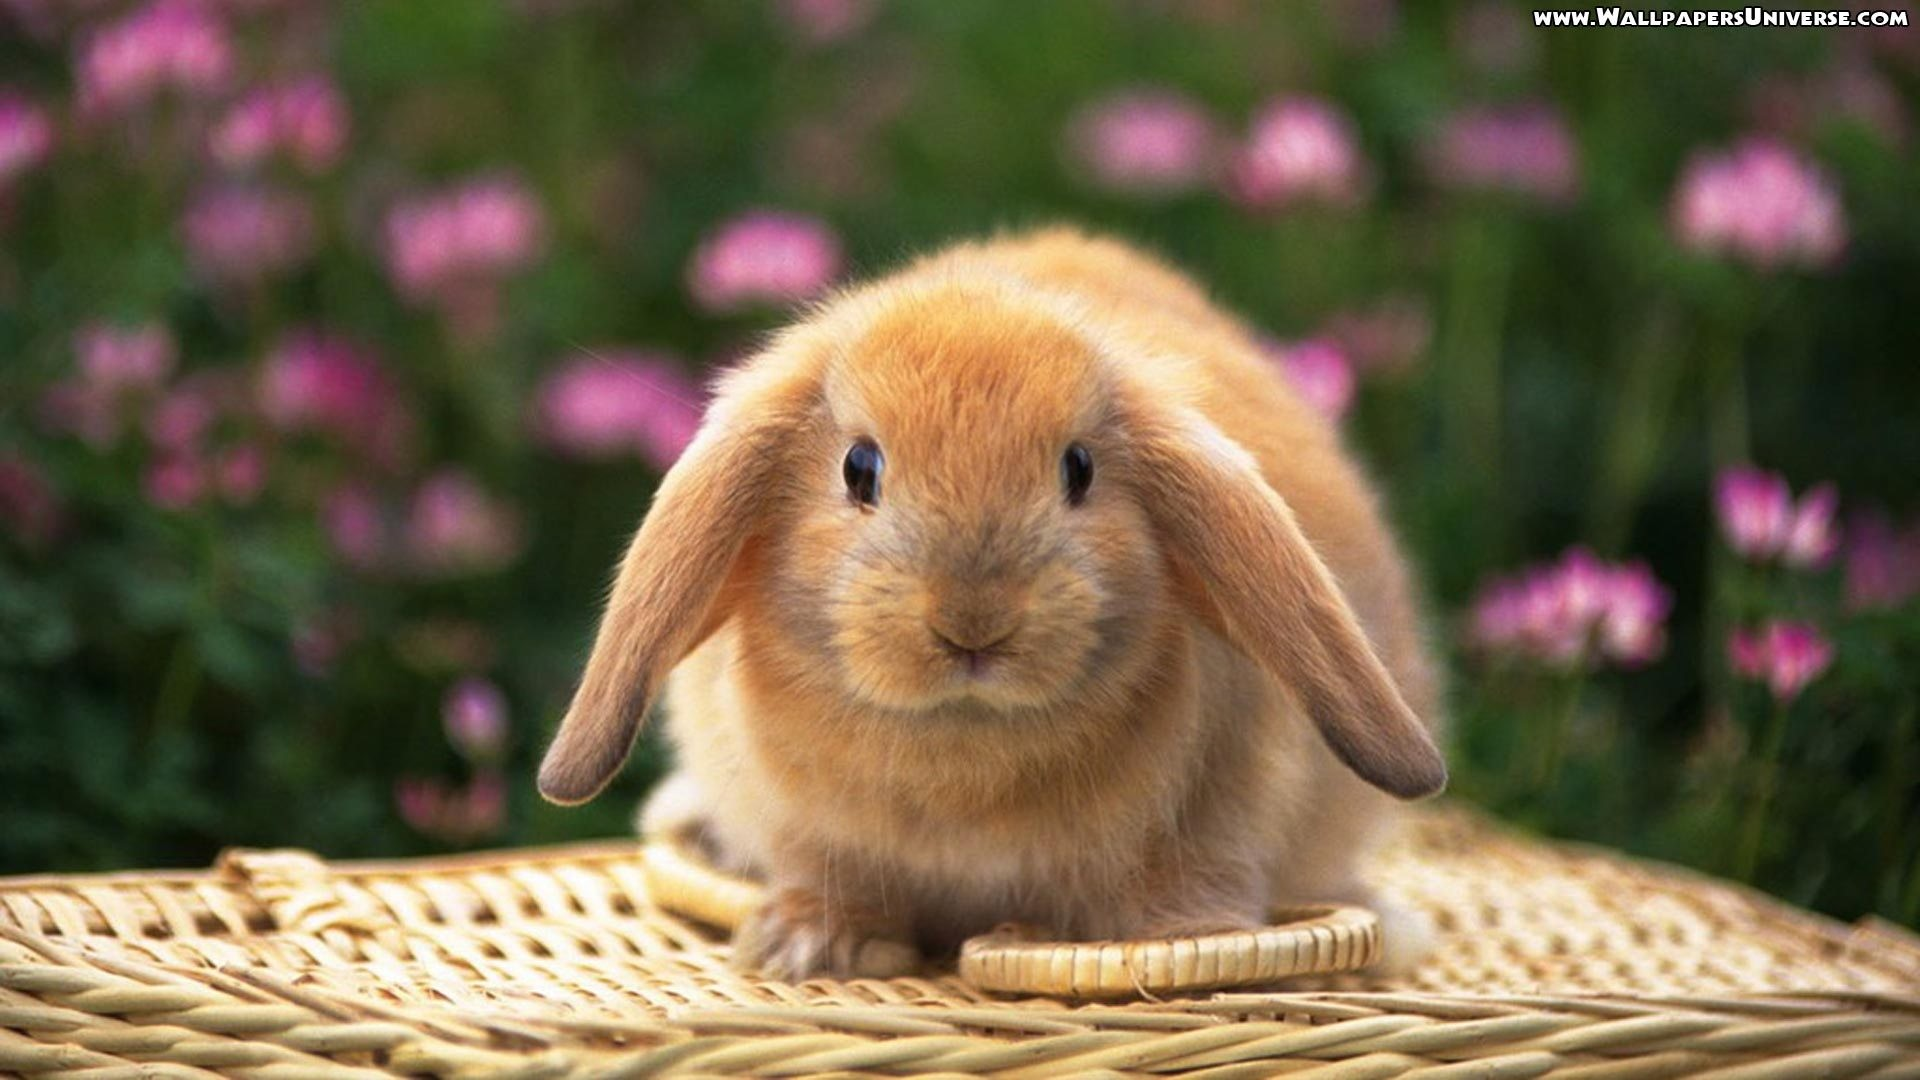 Pics Photos Cute Easter Bunny Rabbits Cute Easter Bunny Rabbit Clip